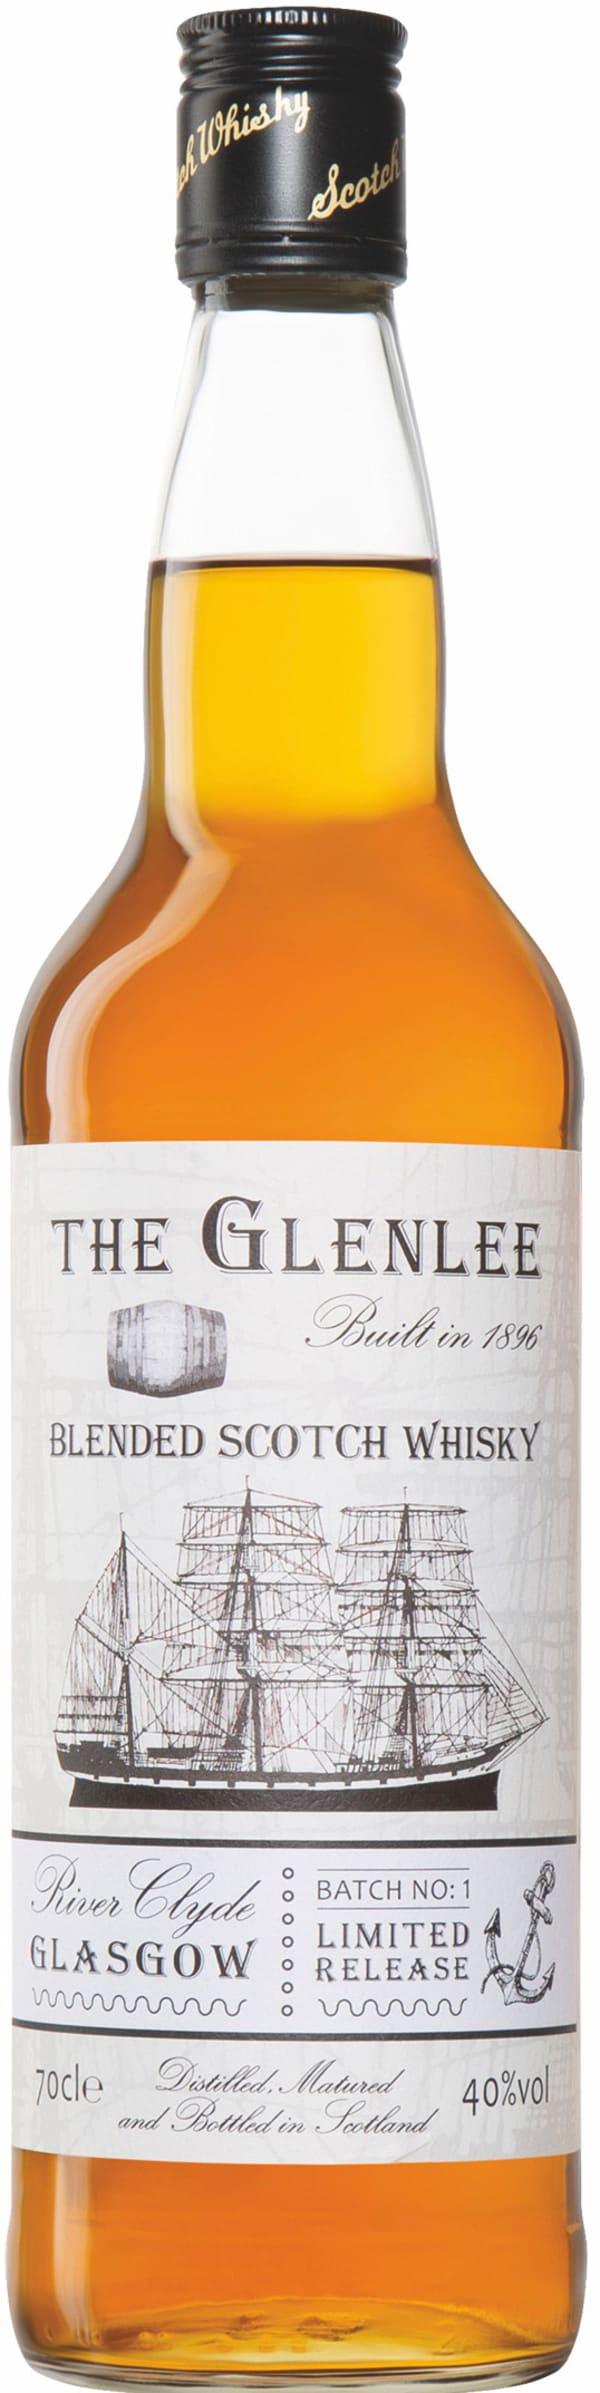 The Glenlee